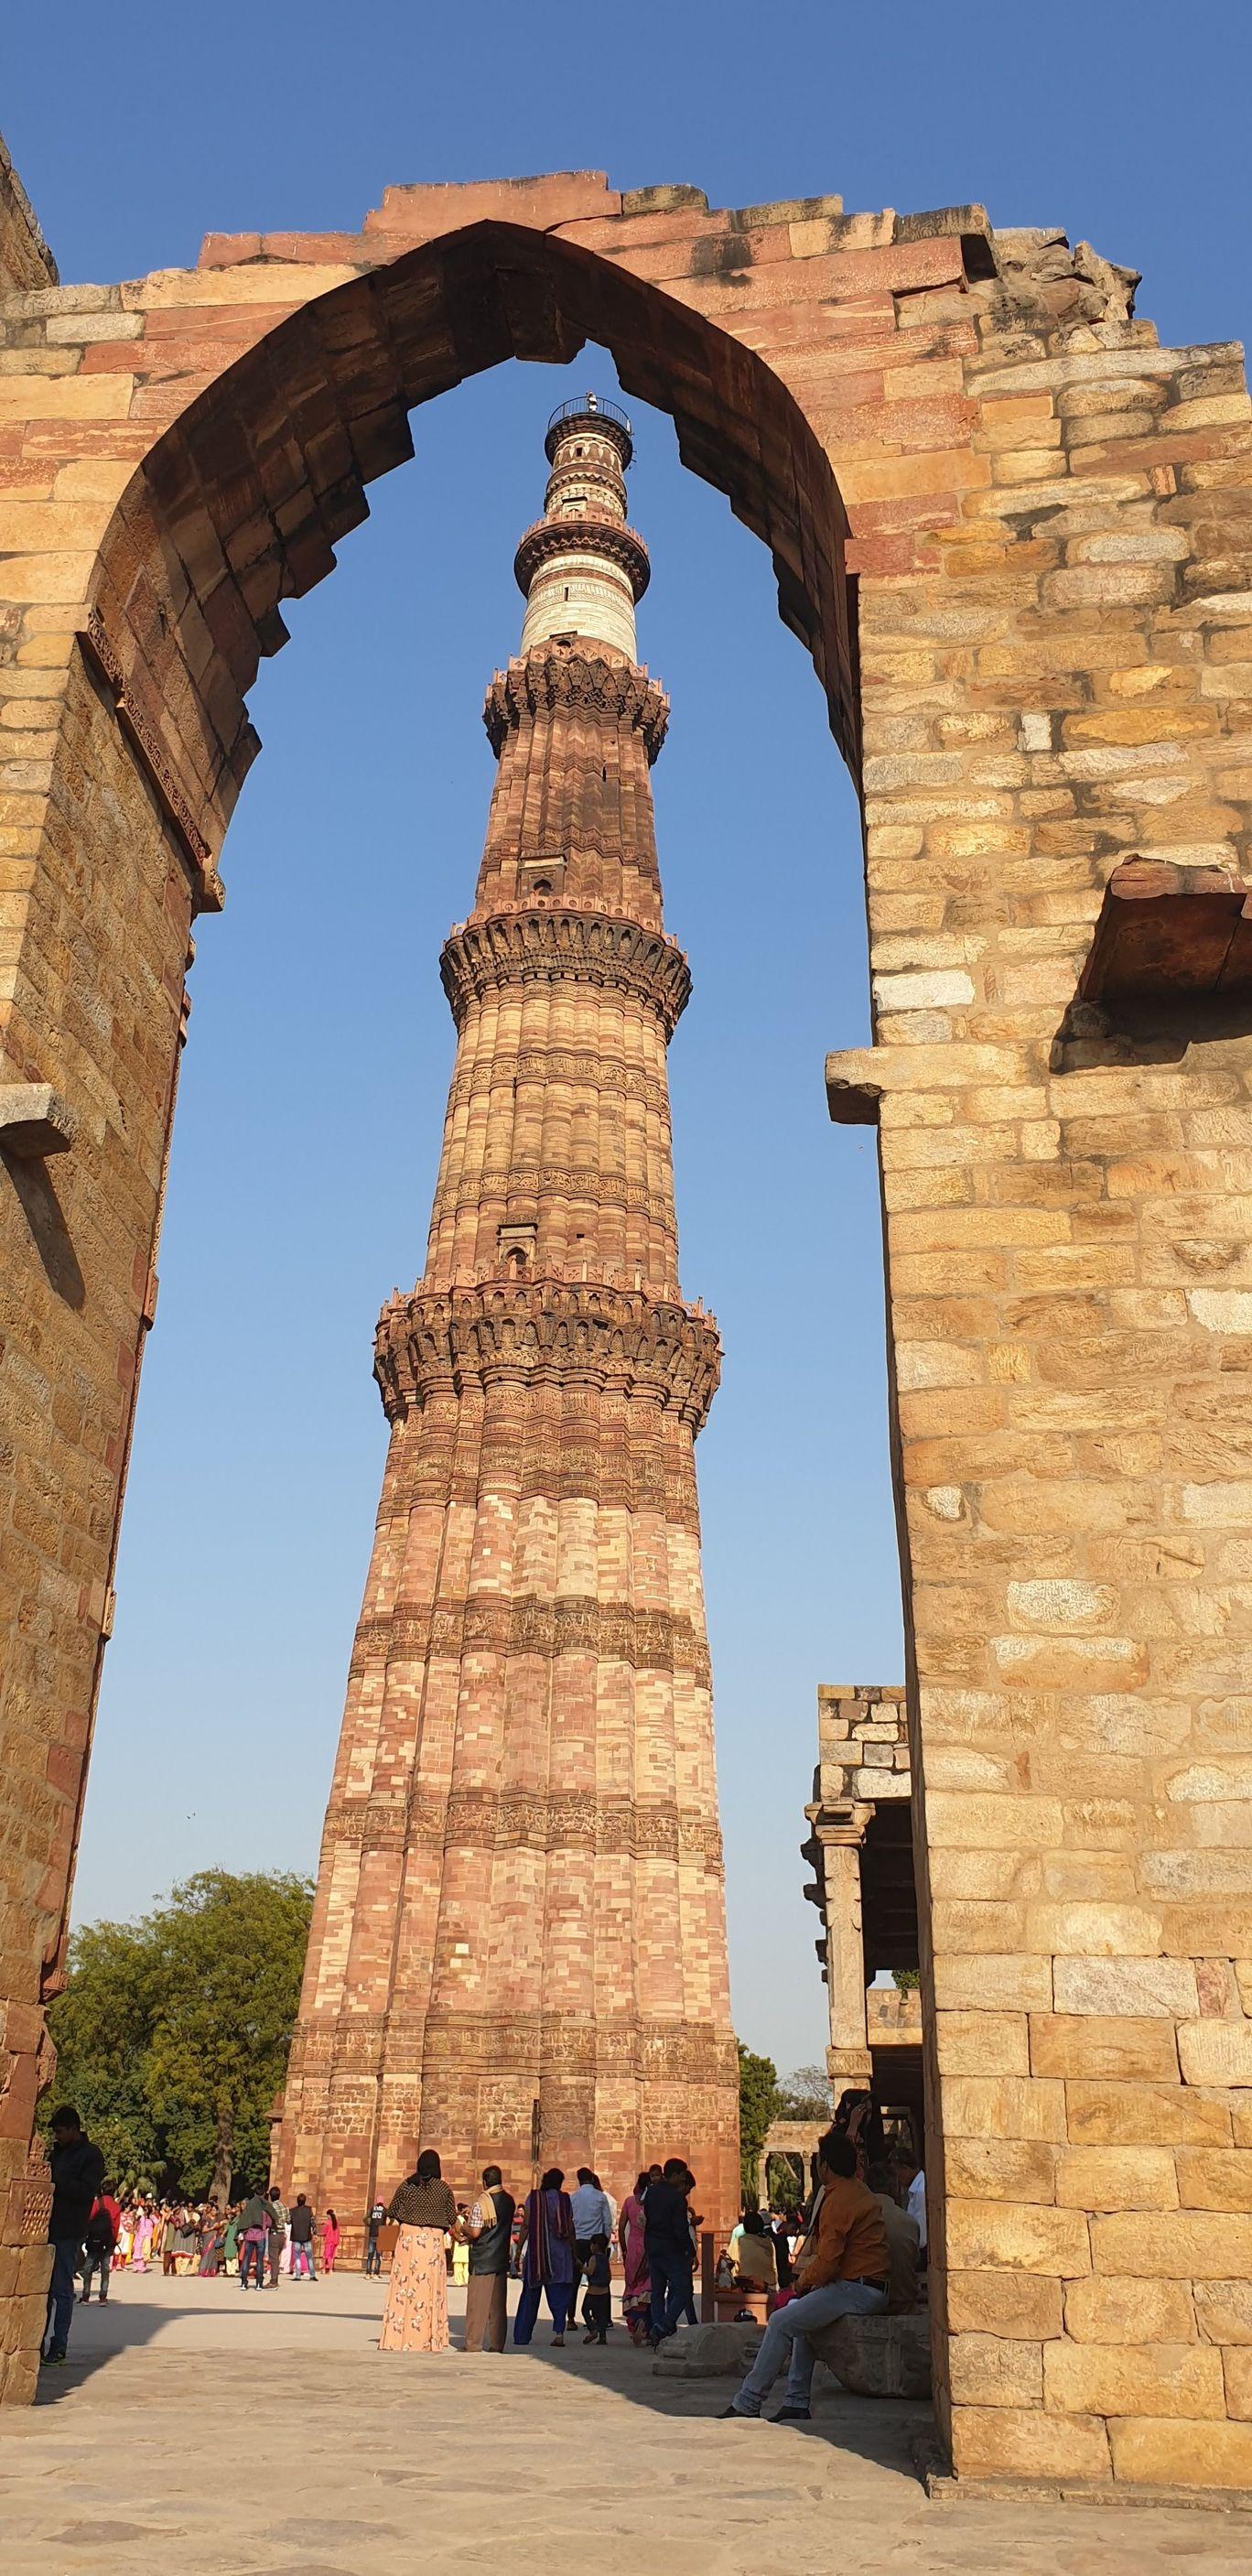 Photo of Qutub Minar By Shivam Kumar Dubey